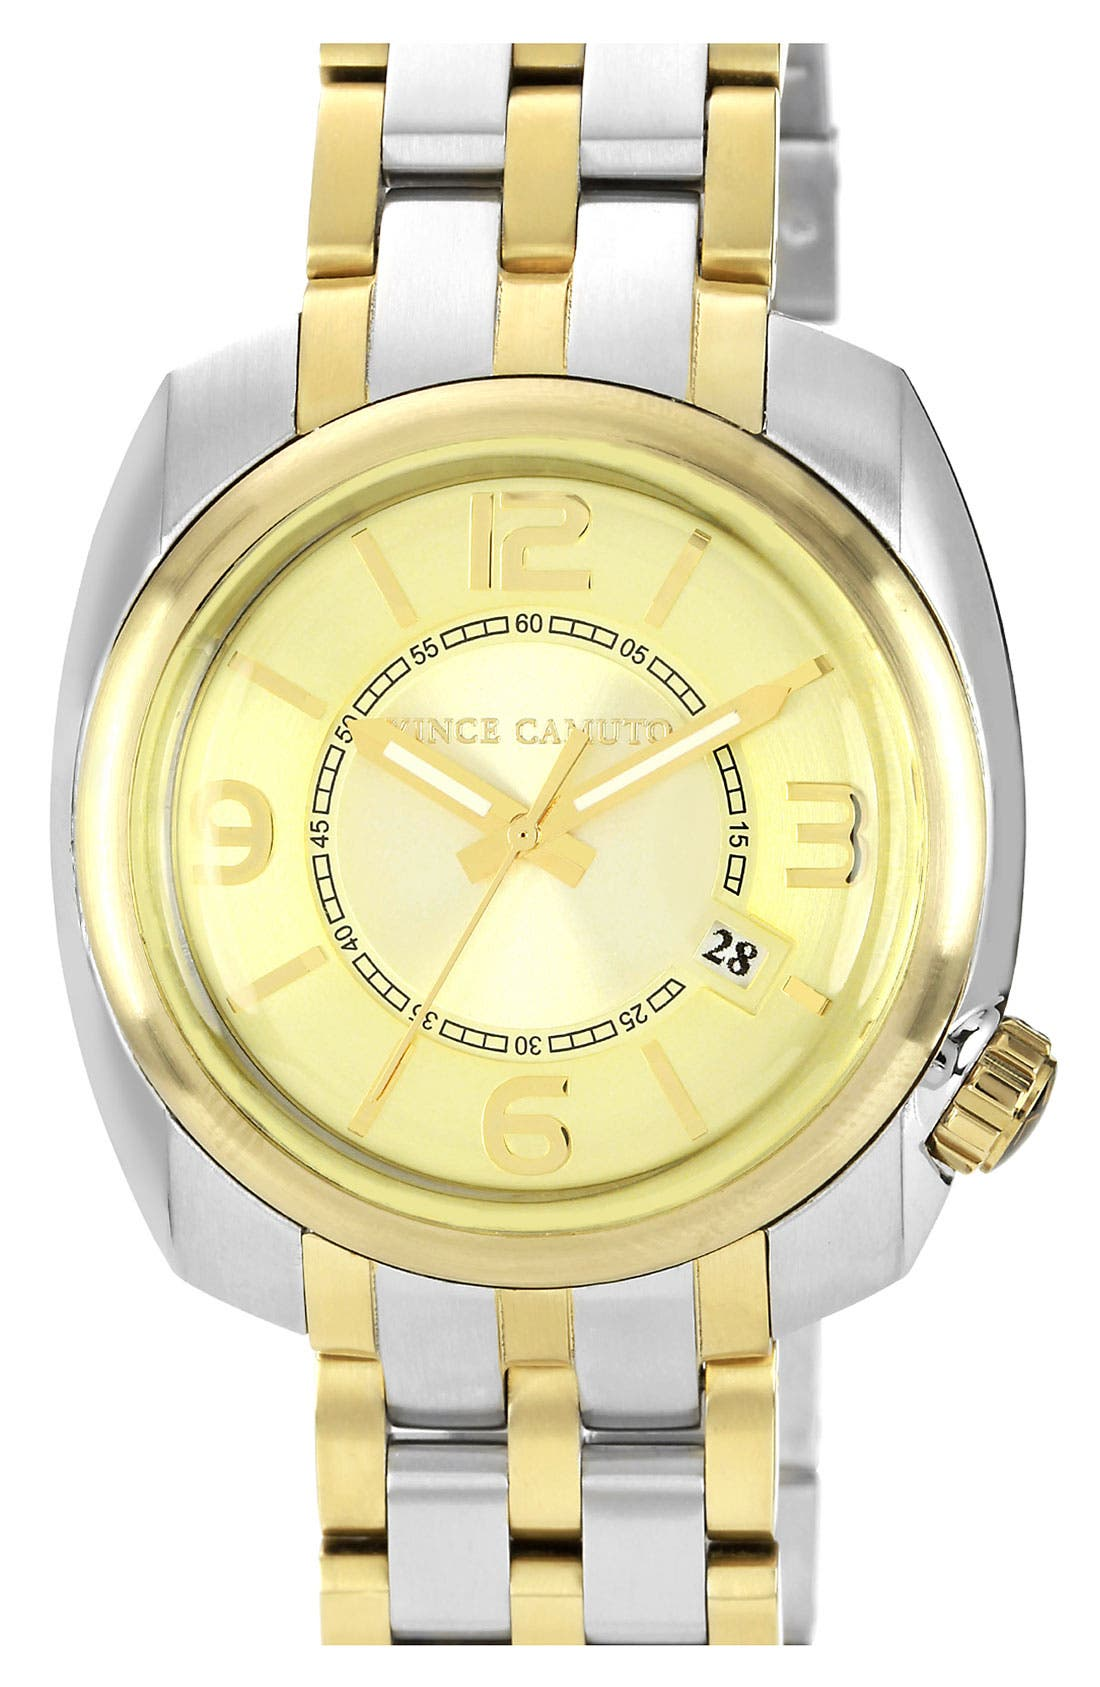 Alternate Image 1 Selected - Vince Camuto Square Case Bracelet Watch, 42mm